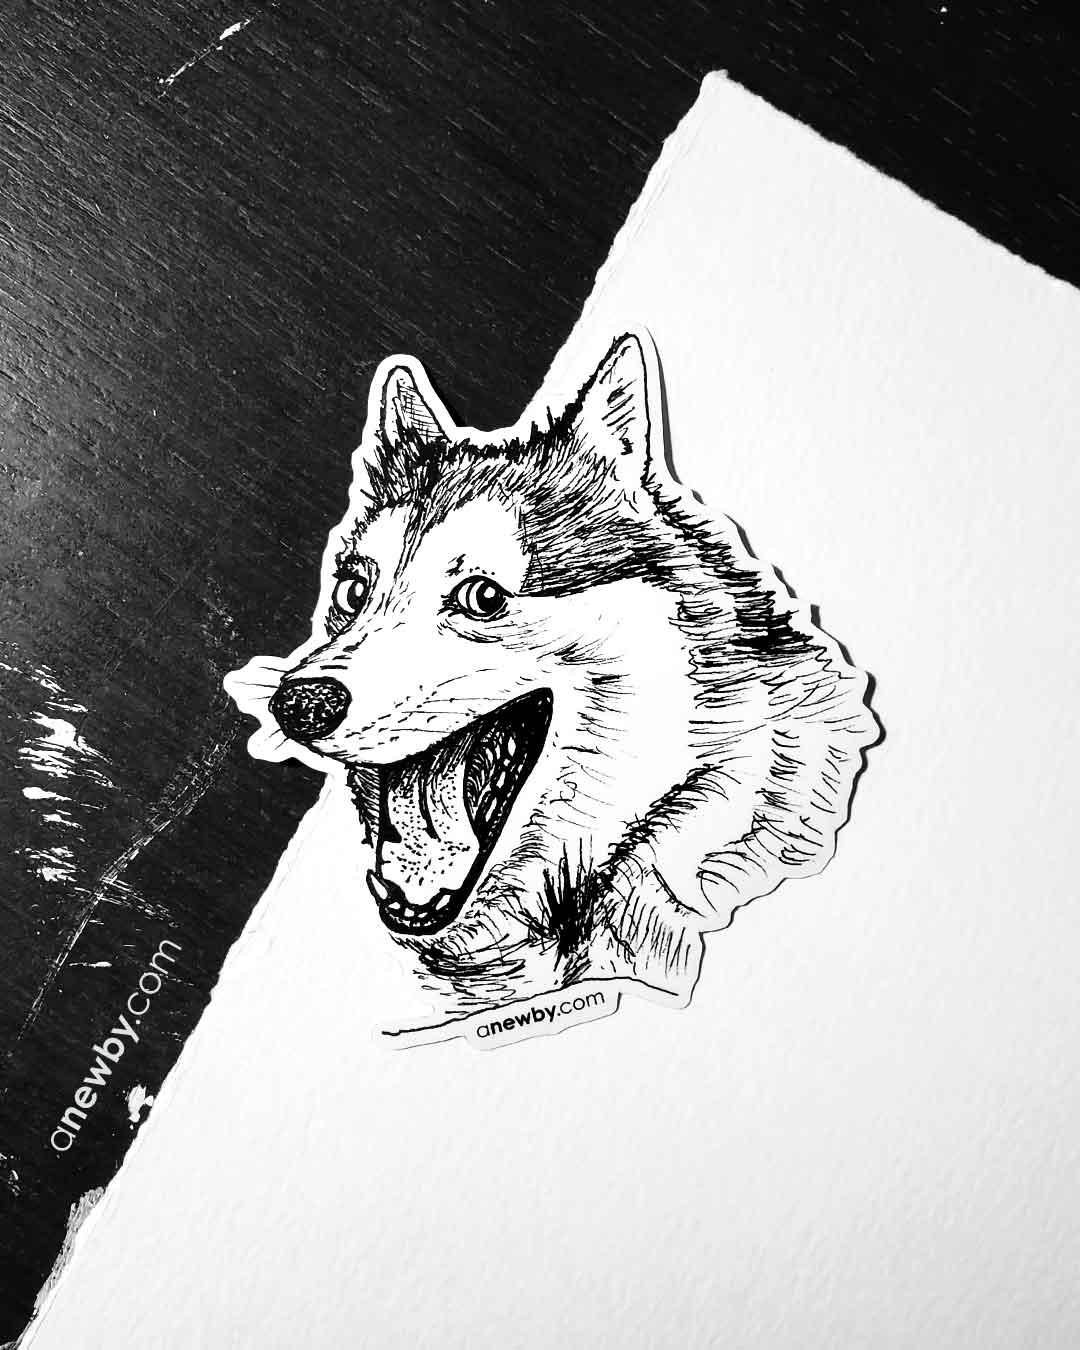 Pun Dog Sticker by Newby